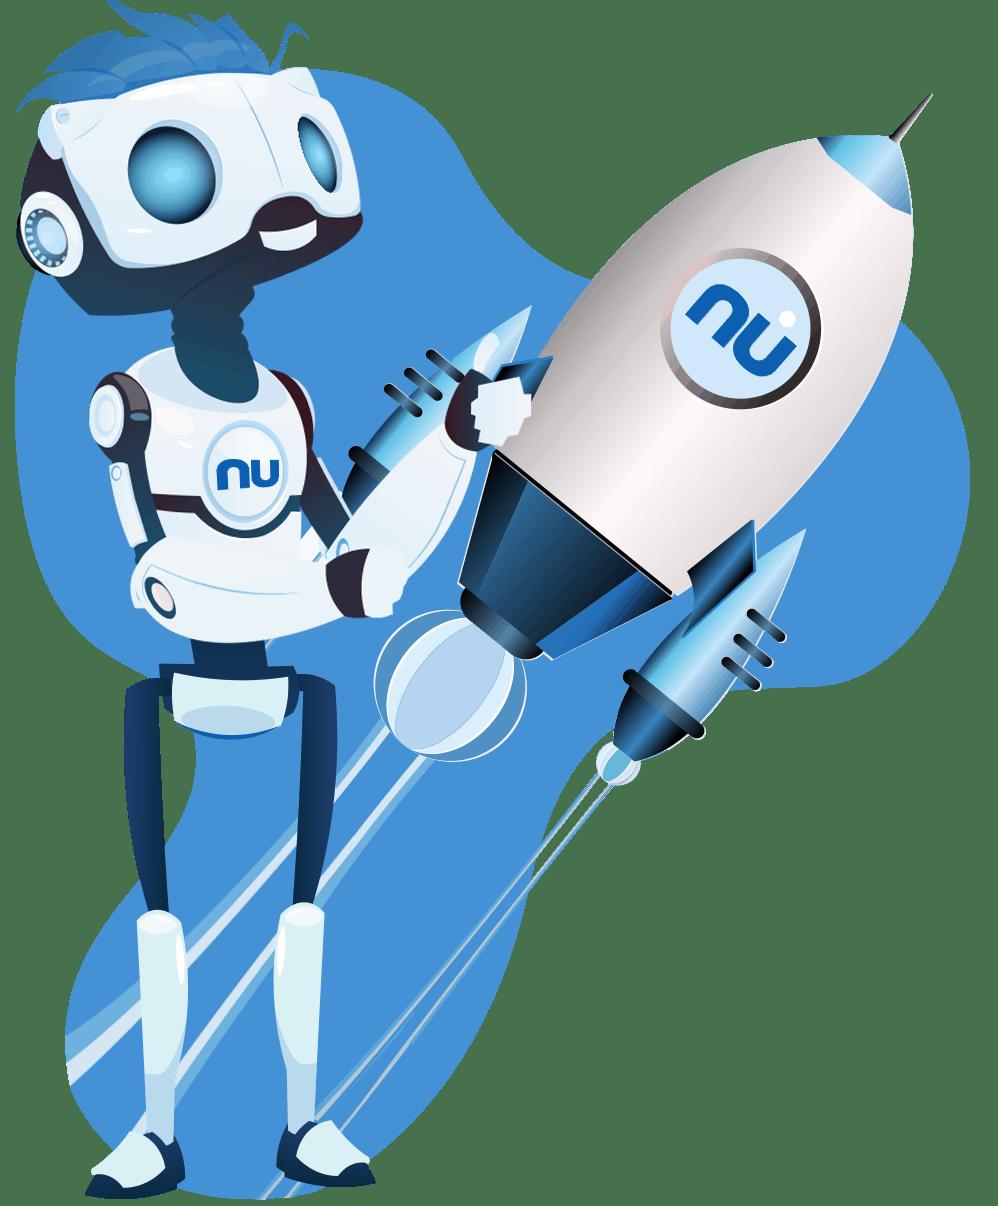 nusenet usenet newsgroup rocket speeds